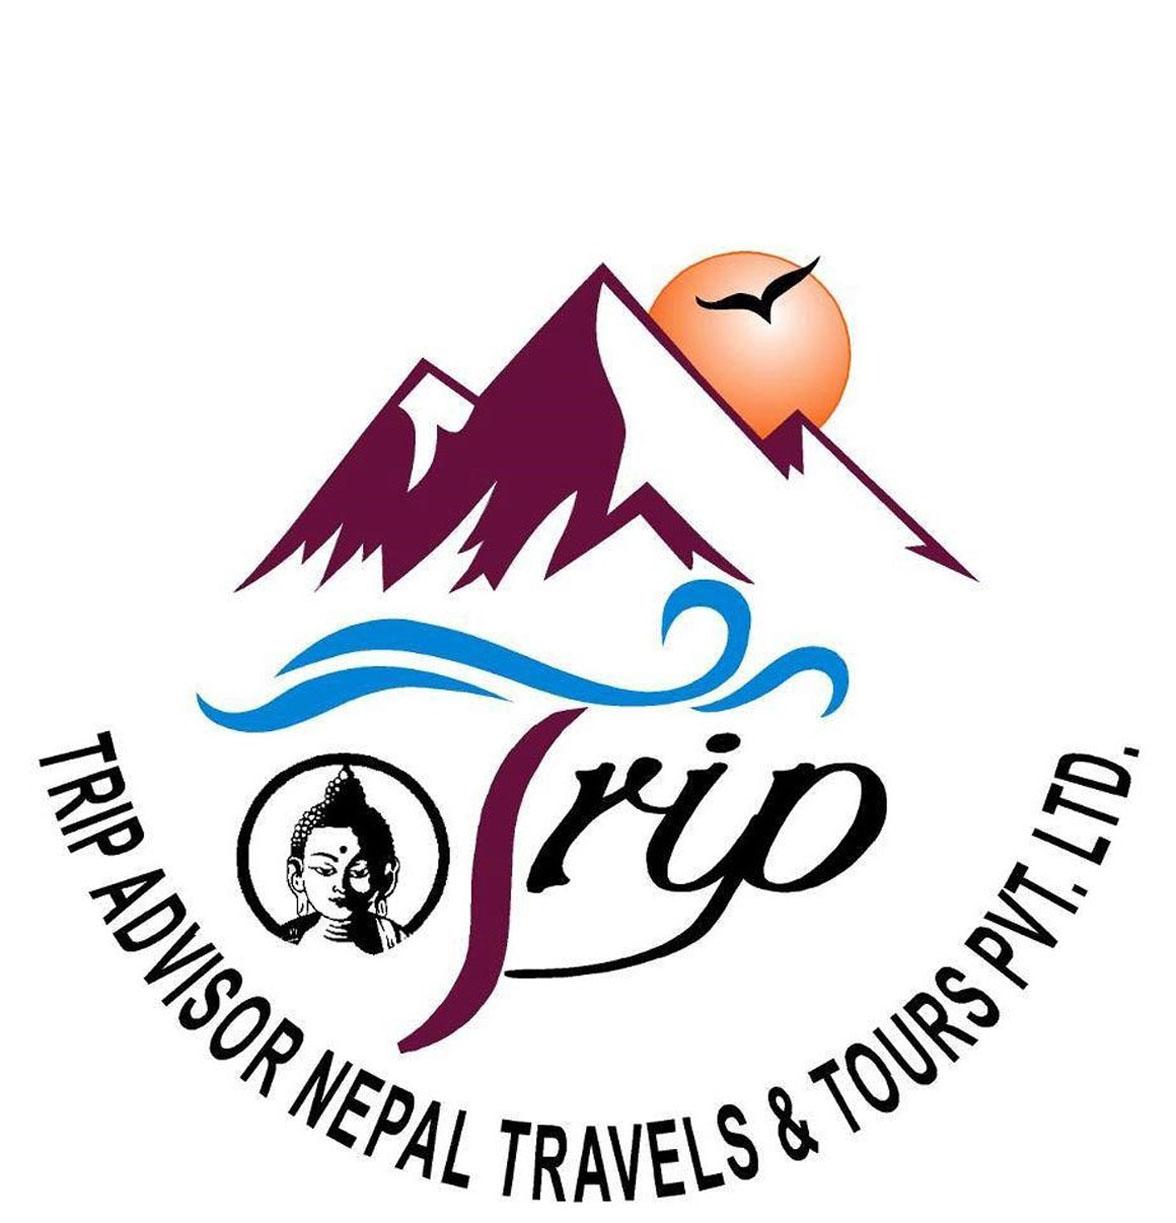 Trip Advisor Nepal Travels & Tours